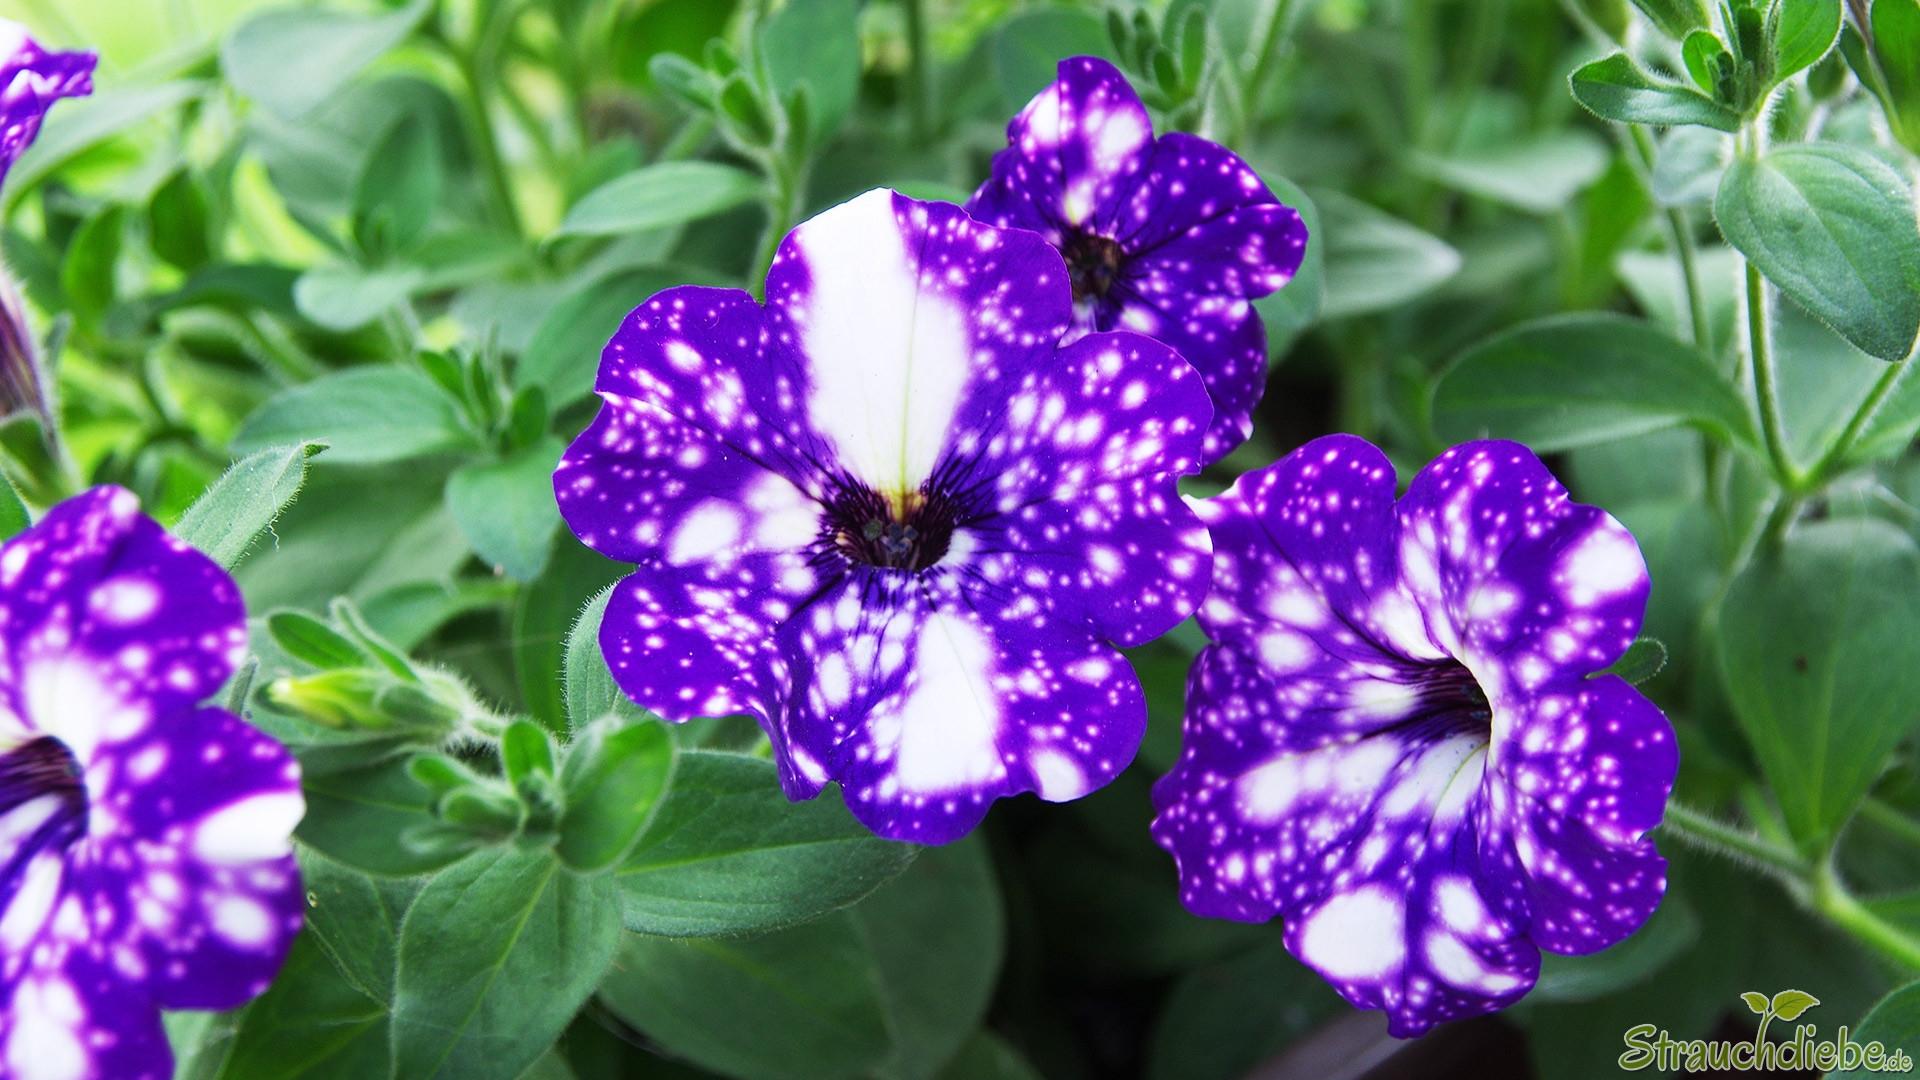 Hänge-Petunie (Petunia 'NightSky')